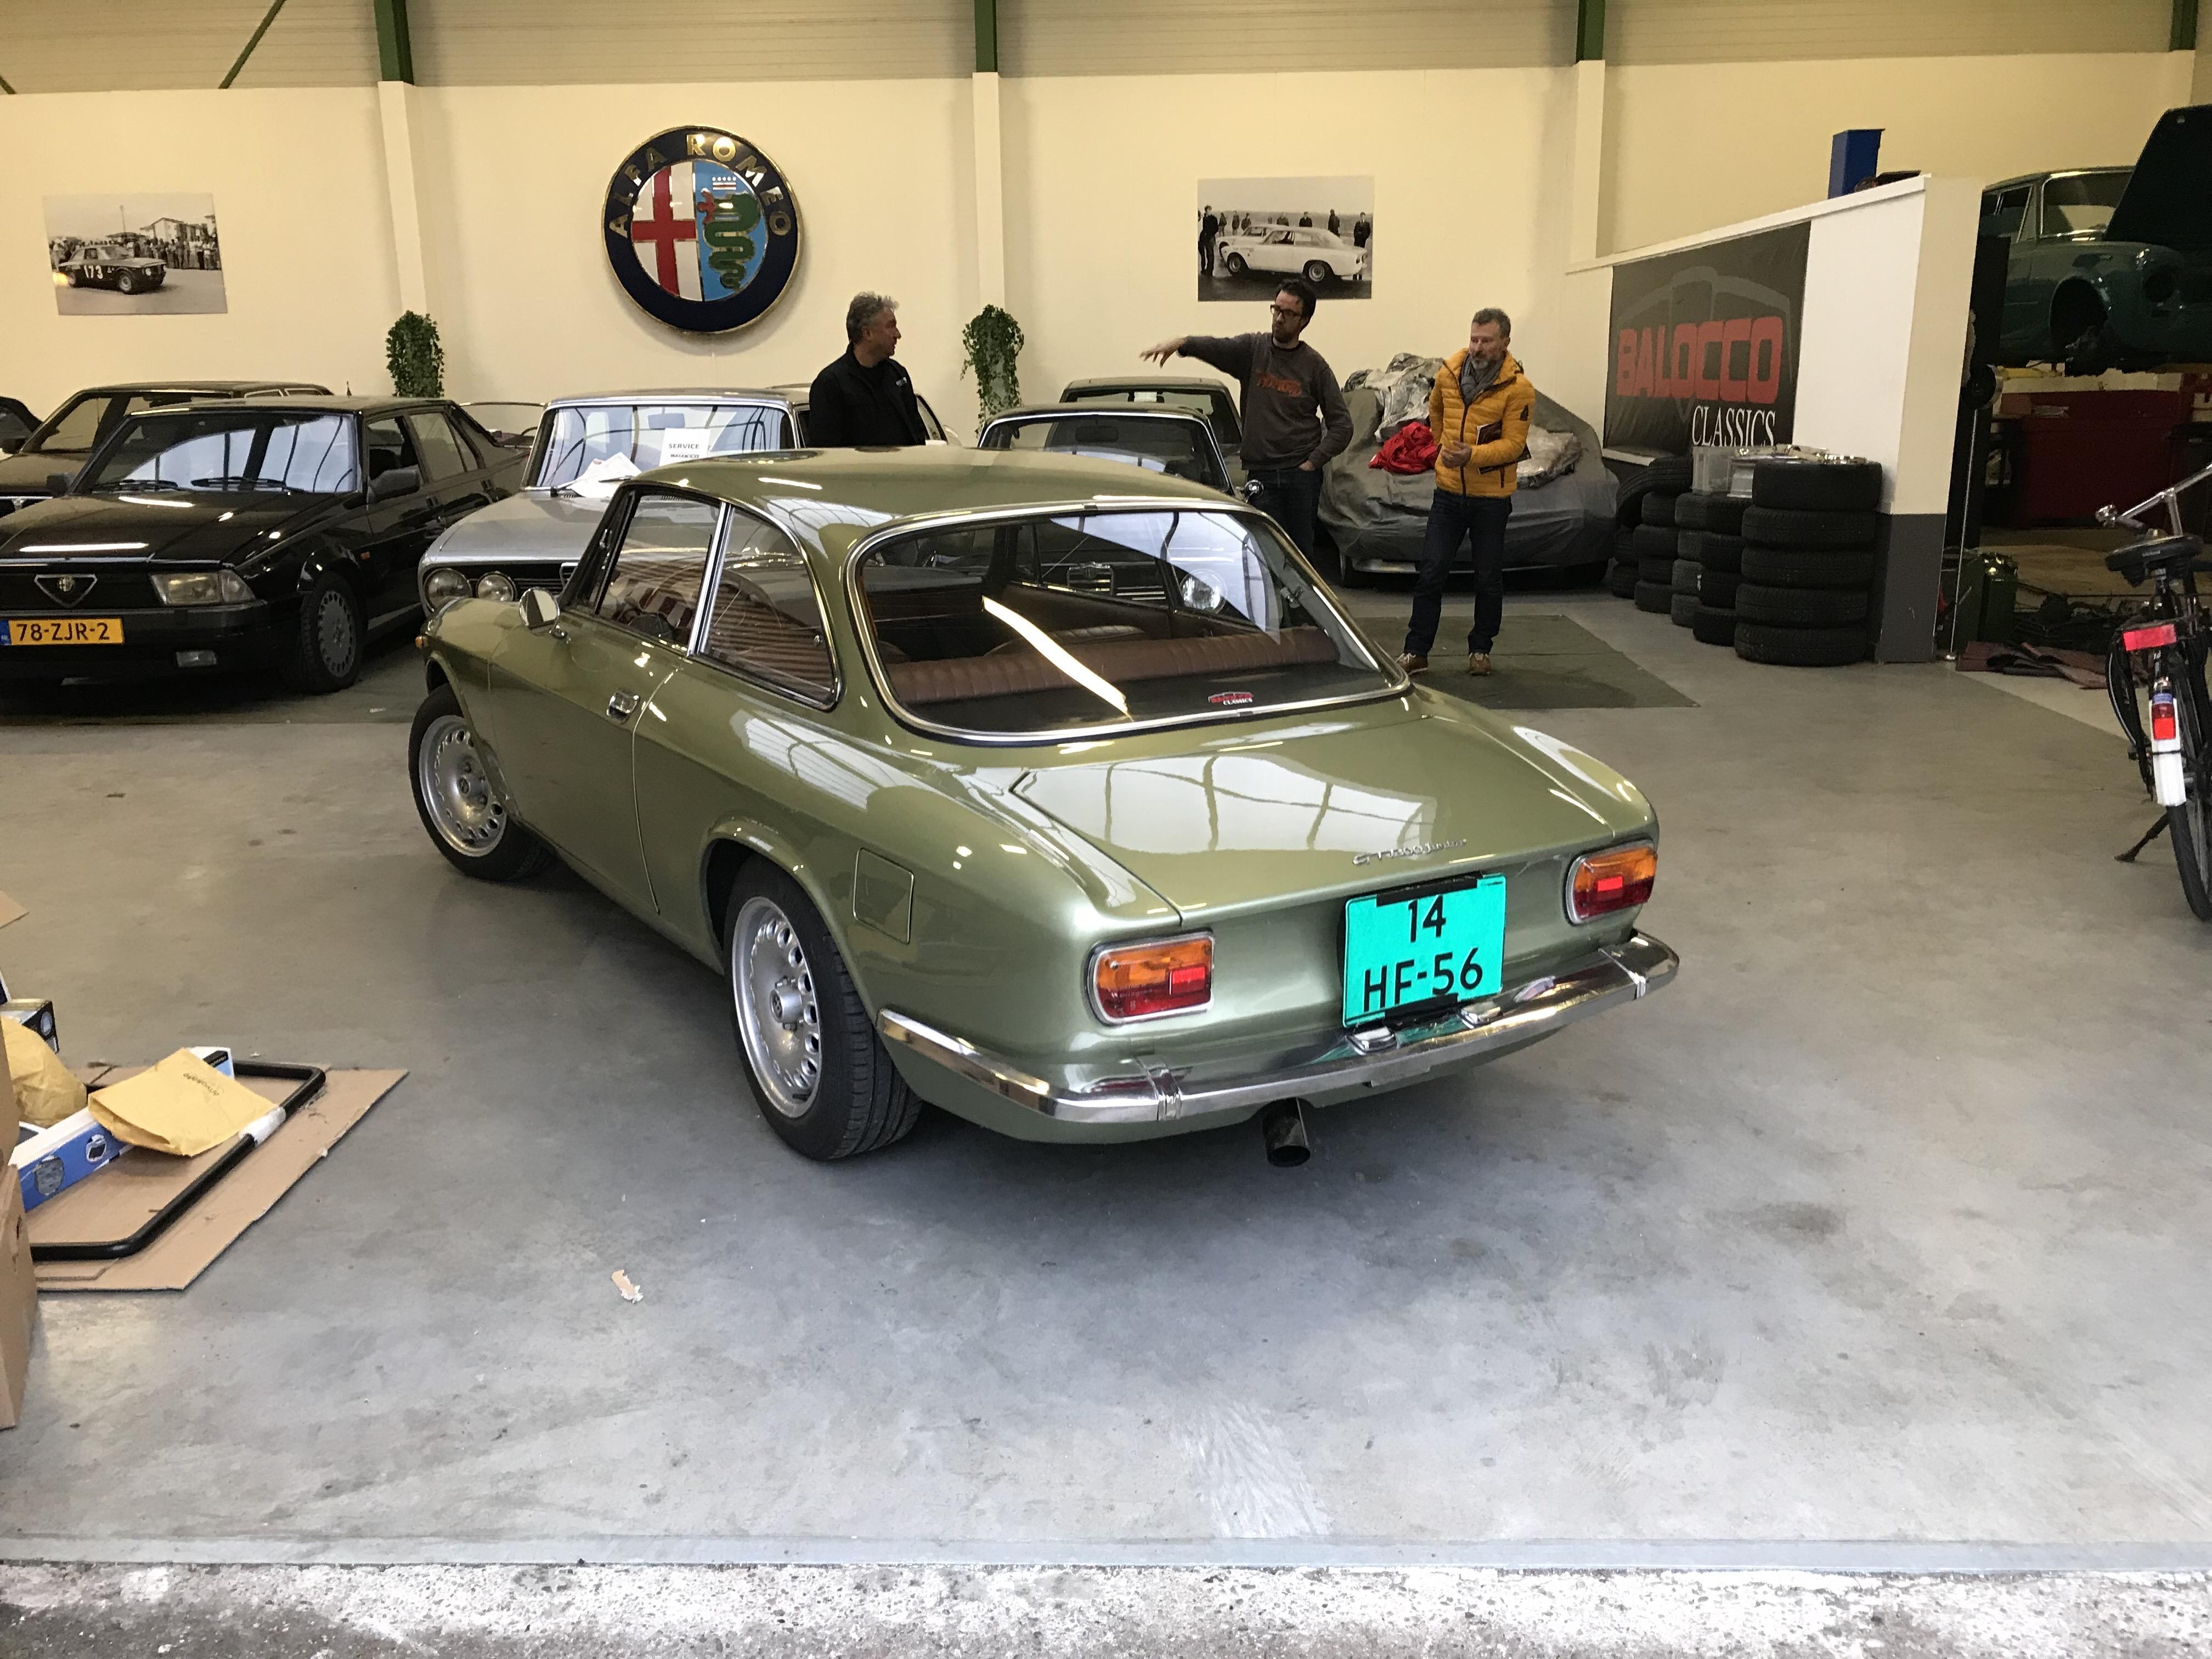 bertone GT 1300 Junior - 1973 - Vert Olive VMxq5g